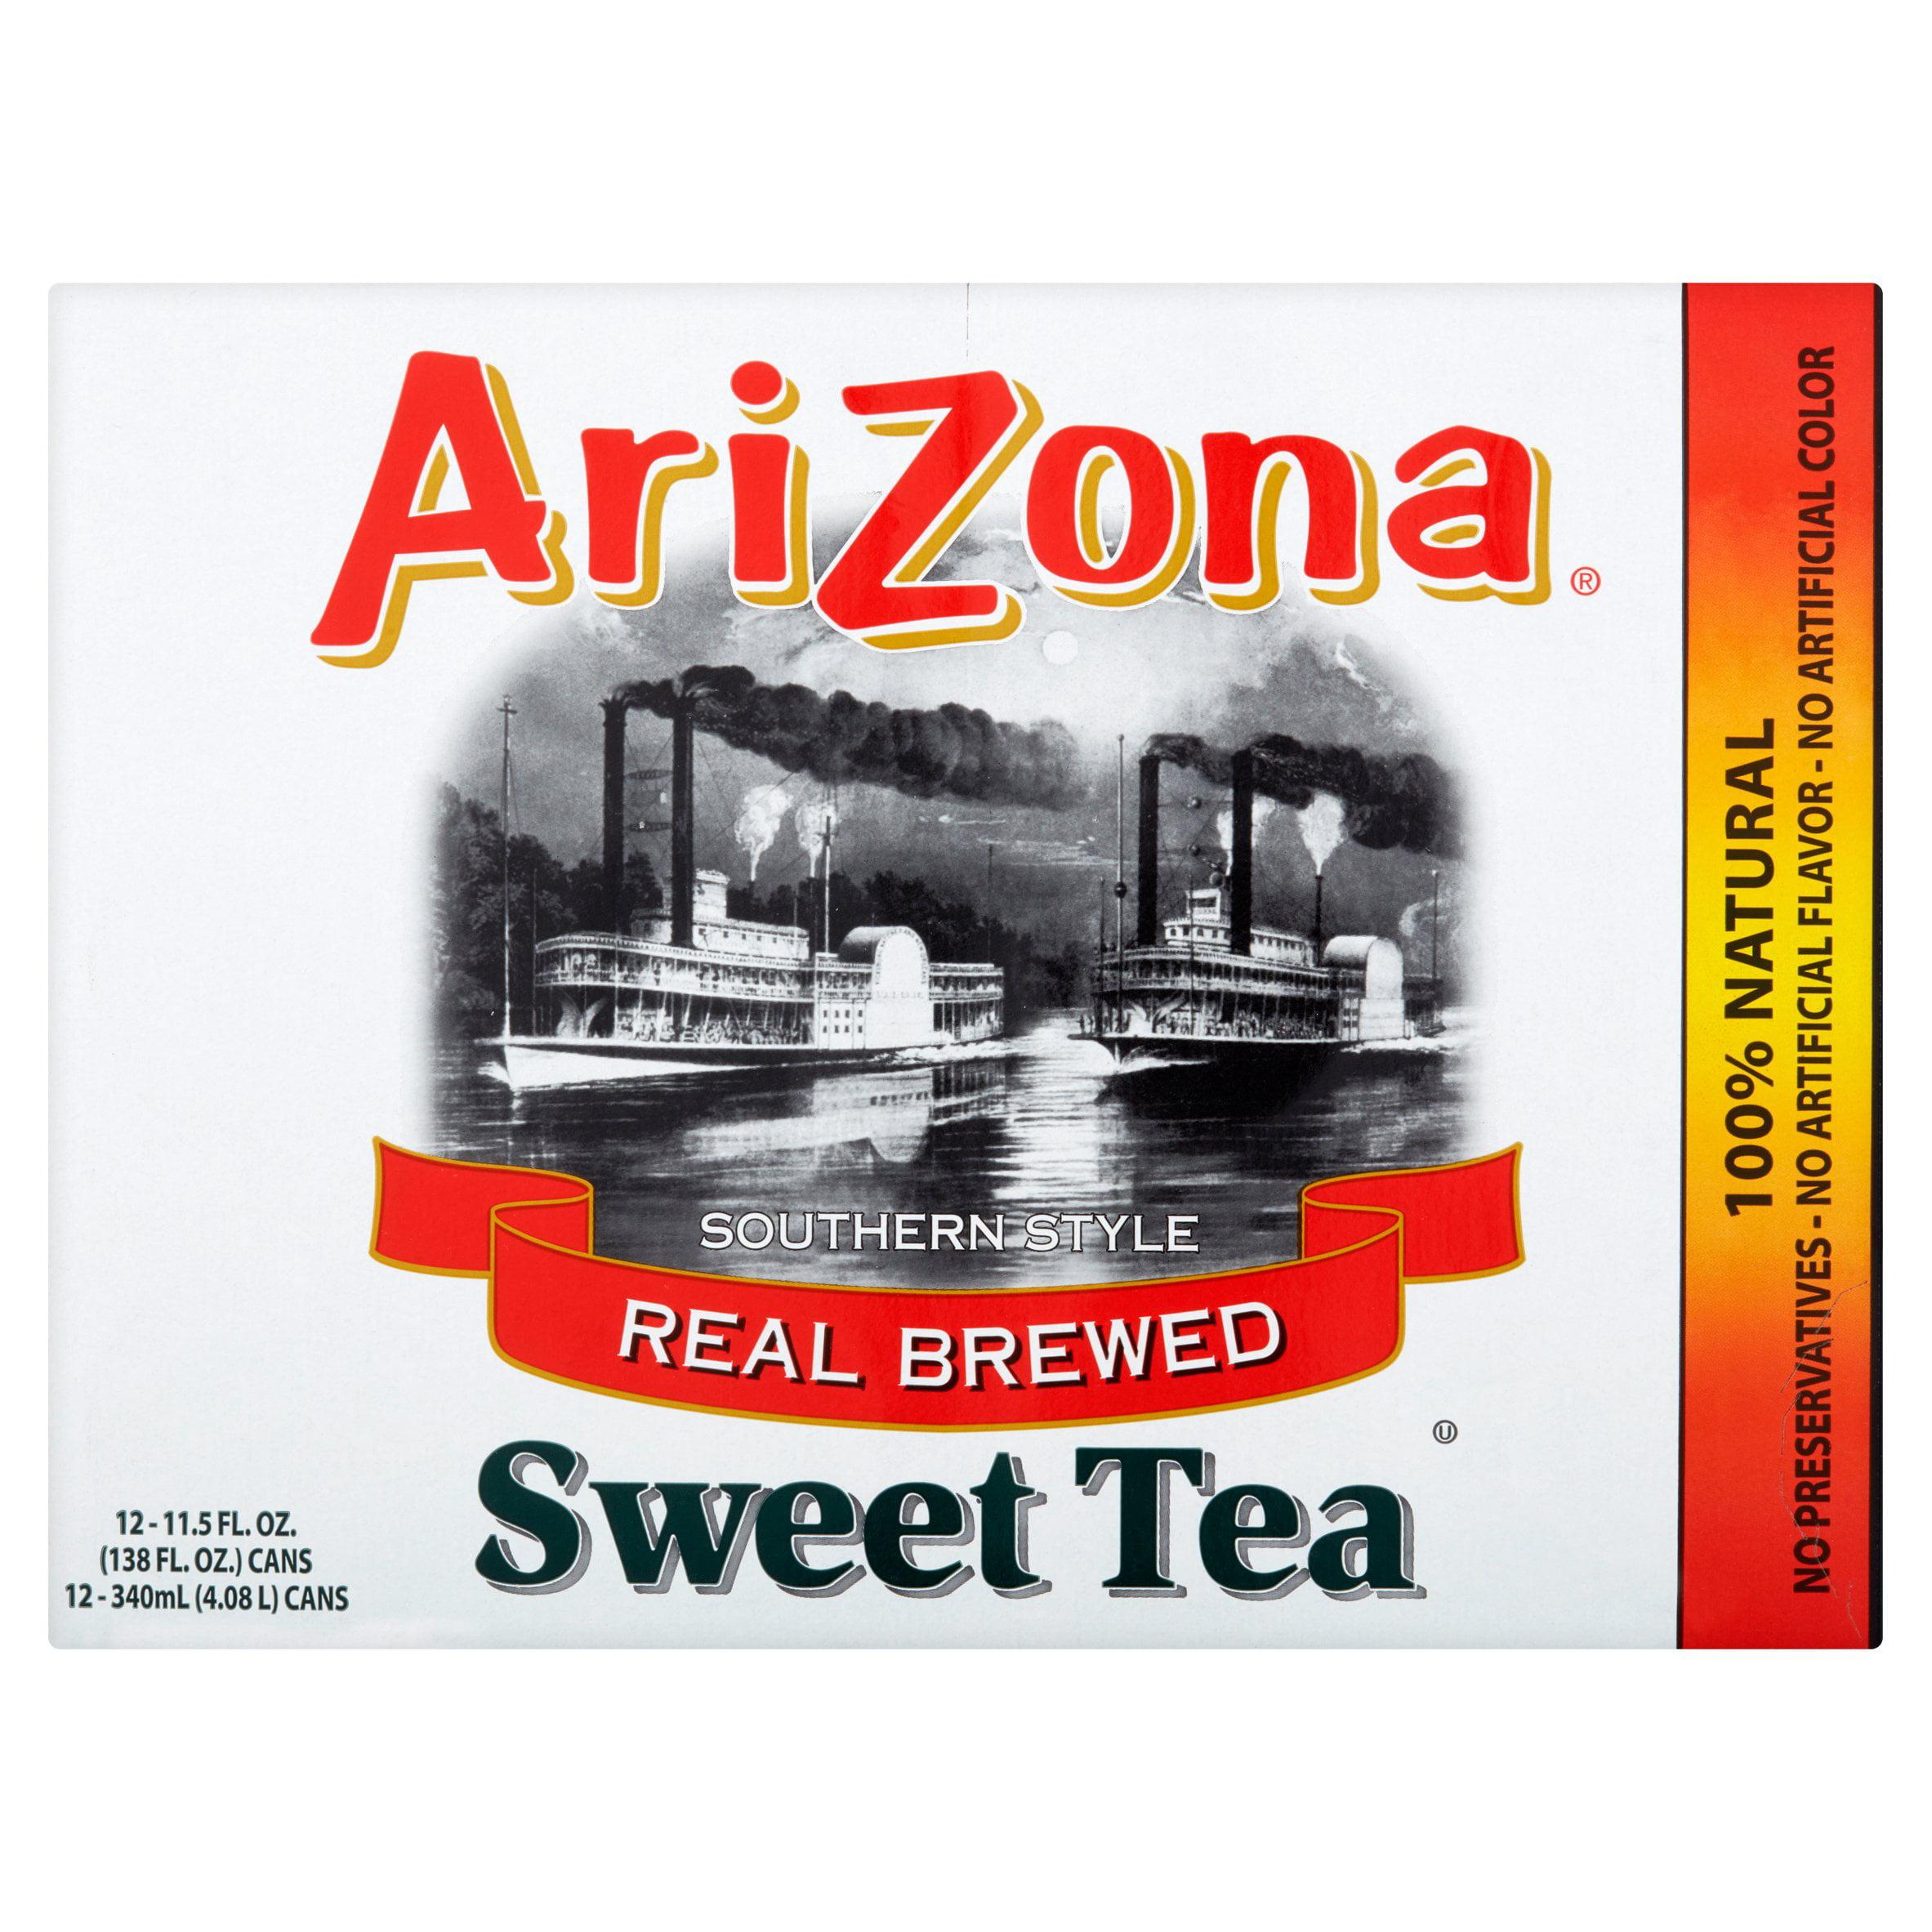 Arizona Southern Style Real Blend Sweet Tea, 11.5 fl oz, 12 count by Arizona Beverages USA LLC